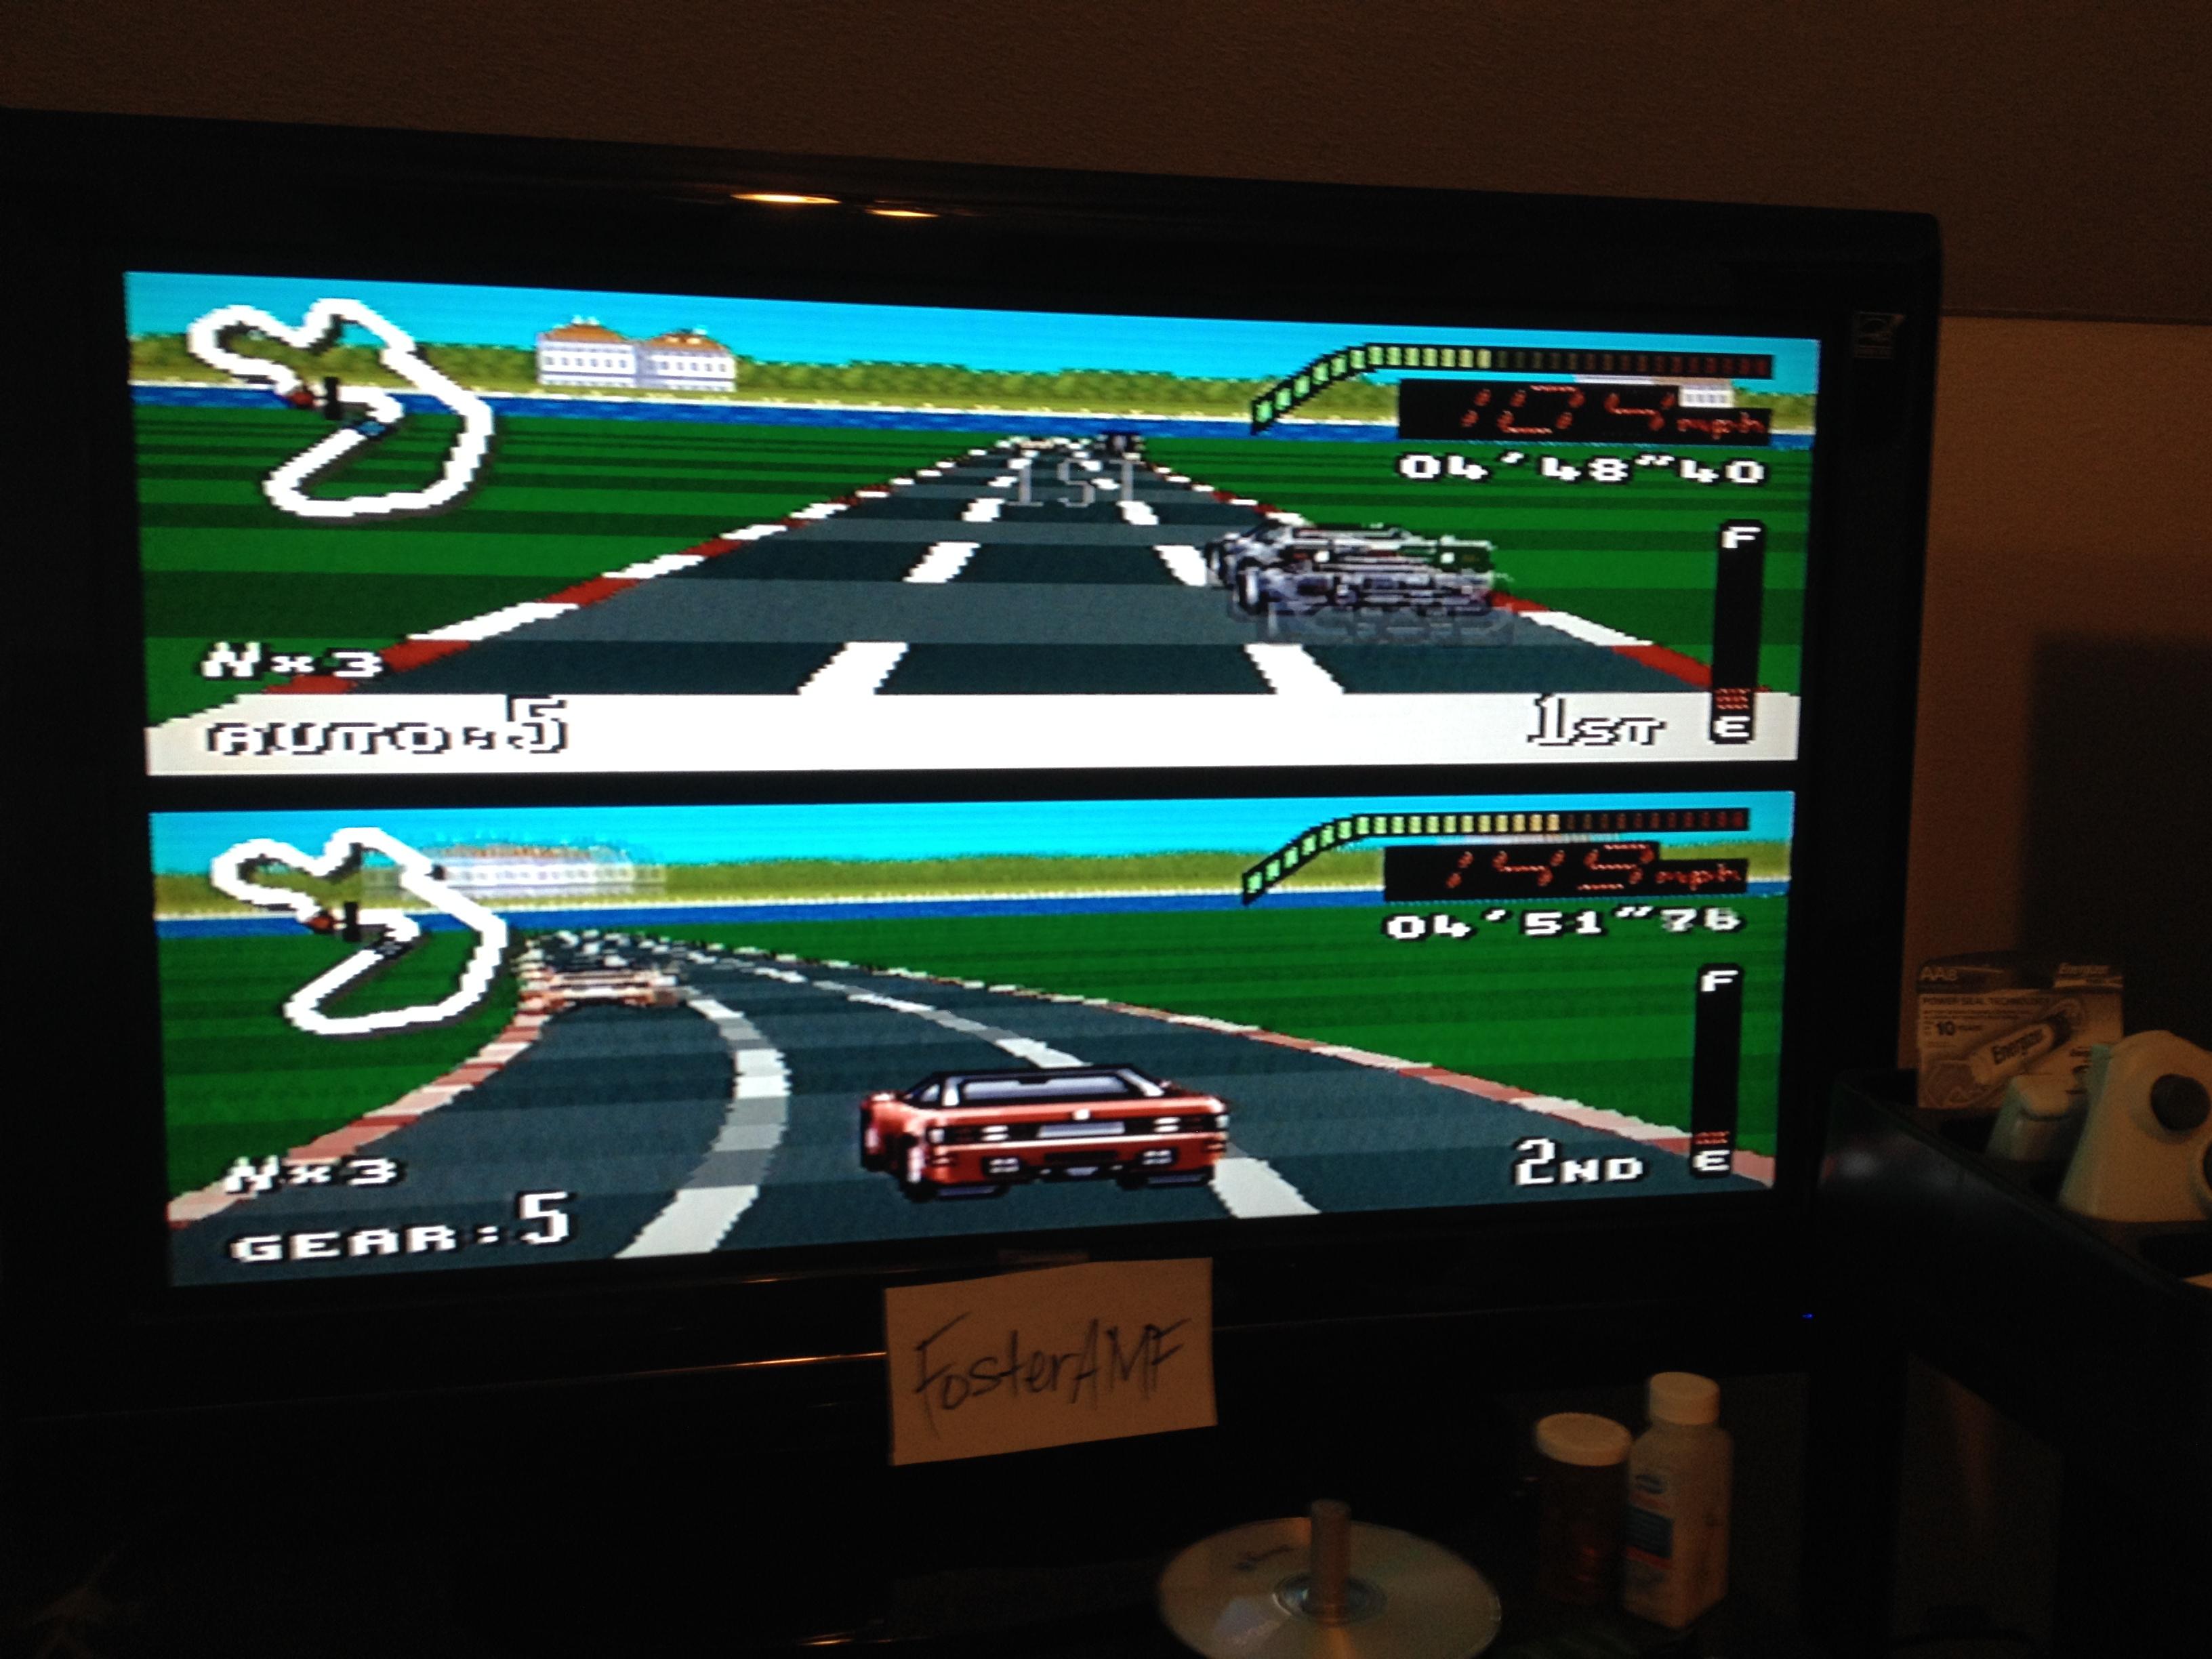 FosterAMF: Top Gear [Track 13: Munich/Amateur Difficulty/No Nitro] (SNES/Super Famicom) 0:04:48.4 points on 2014-07-27 20:56:35